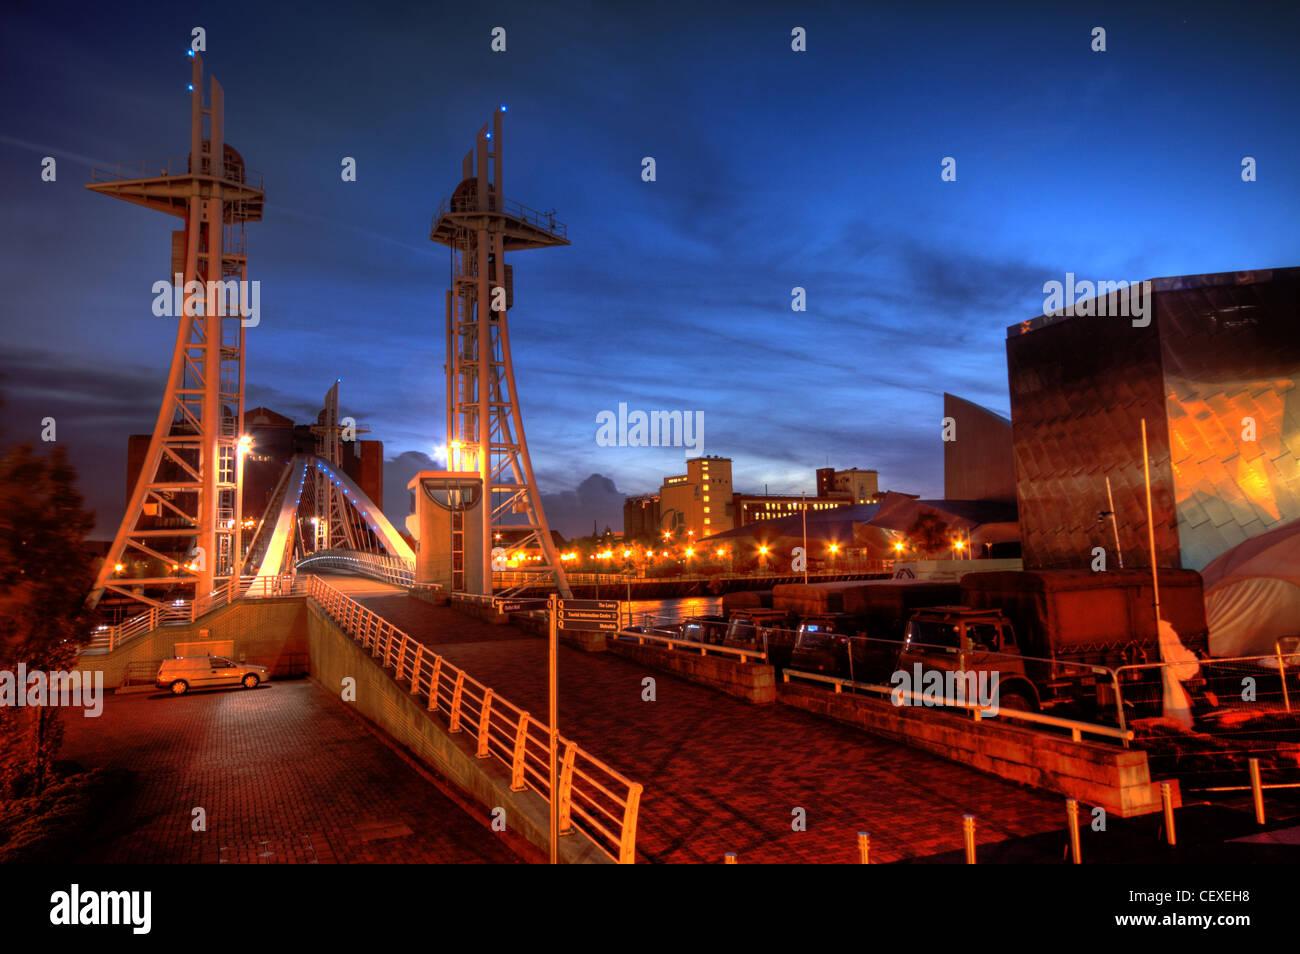 Lowry Salford Quays Millennium Lift Footbridge at dusk - Stock Image